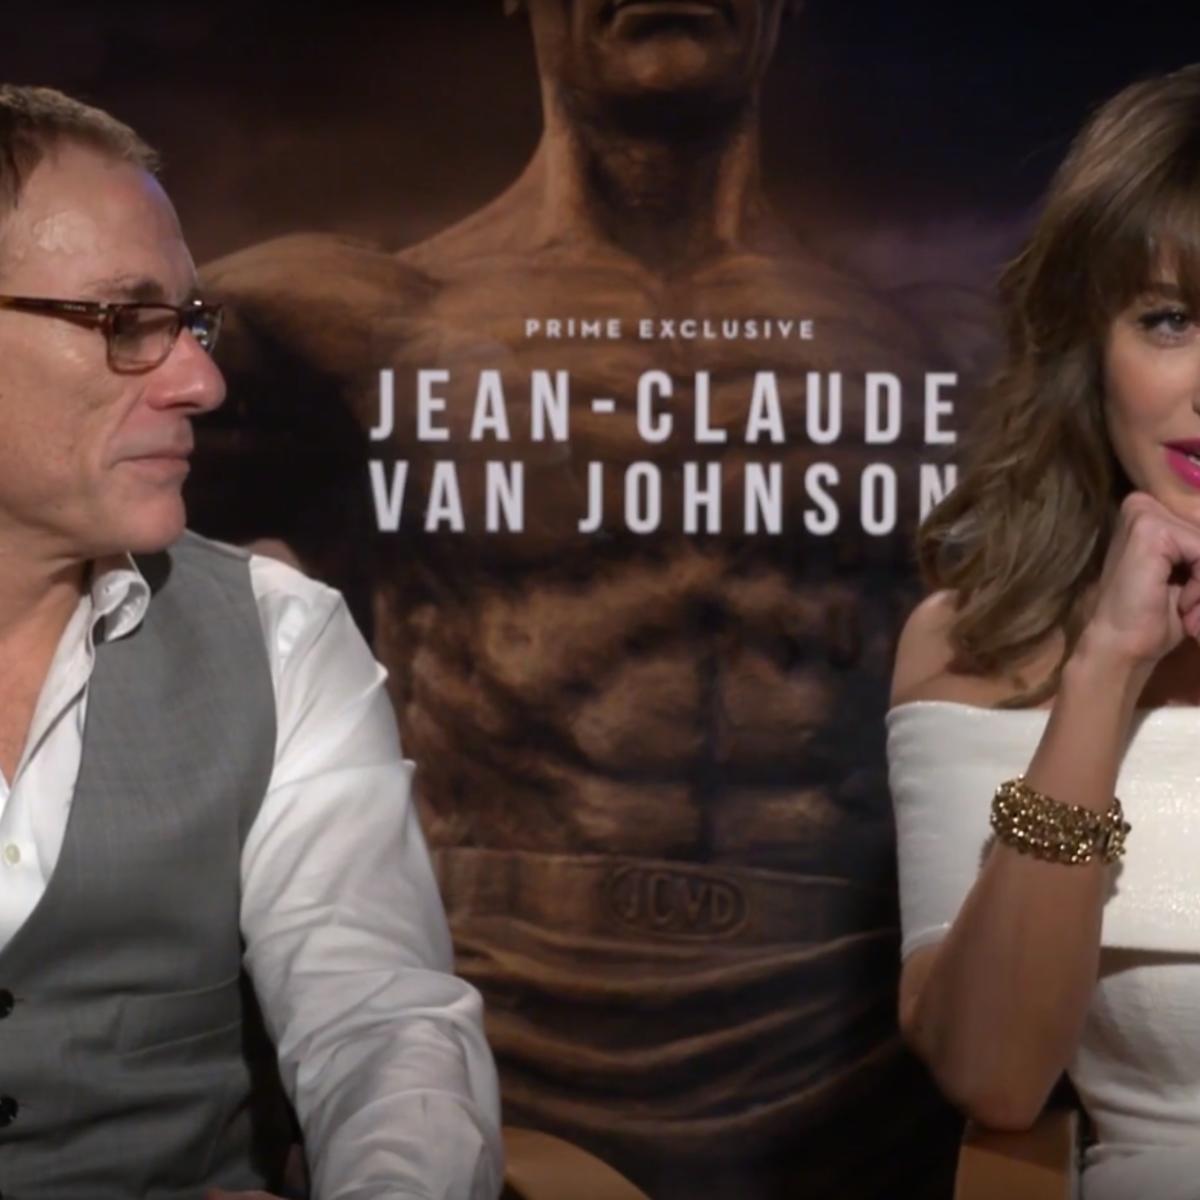 jean-claude-van-damme-kat-foster-jean-claude-van-johnson-interview-syfywire-screengrab.png